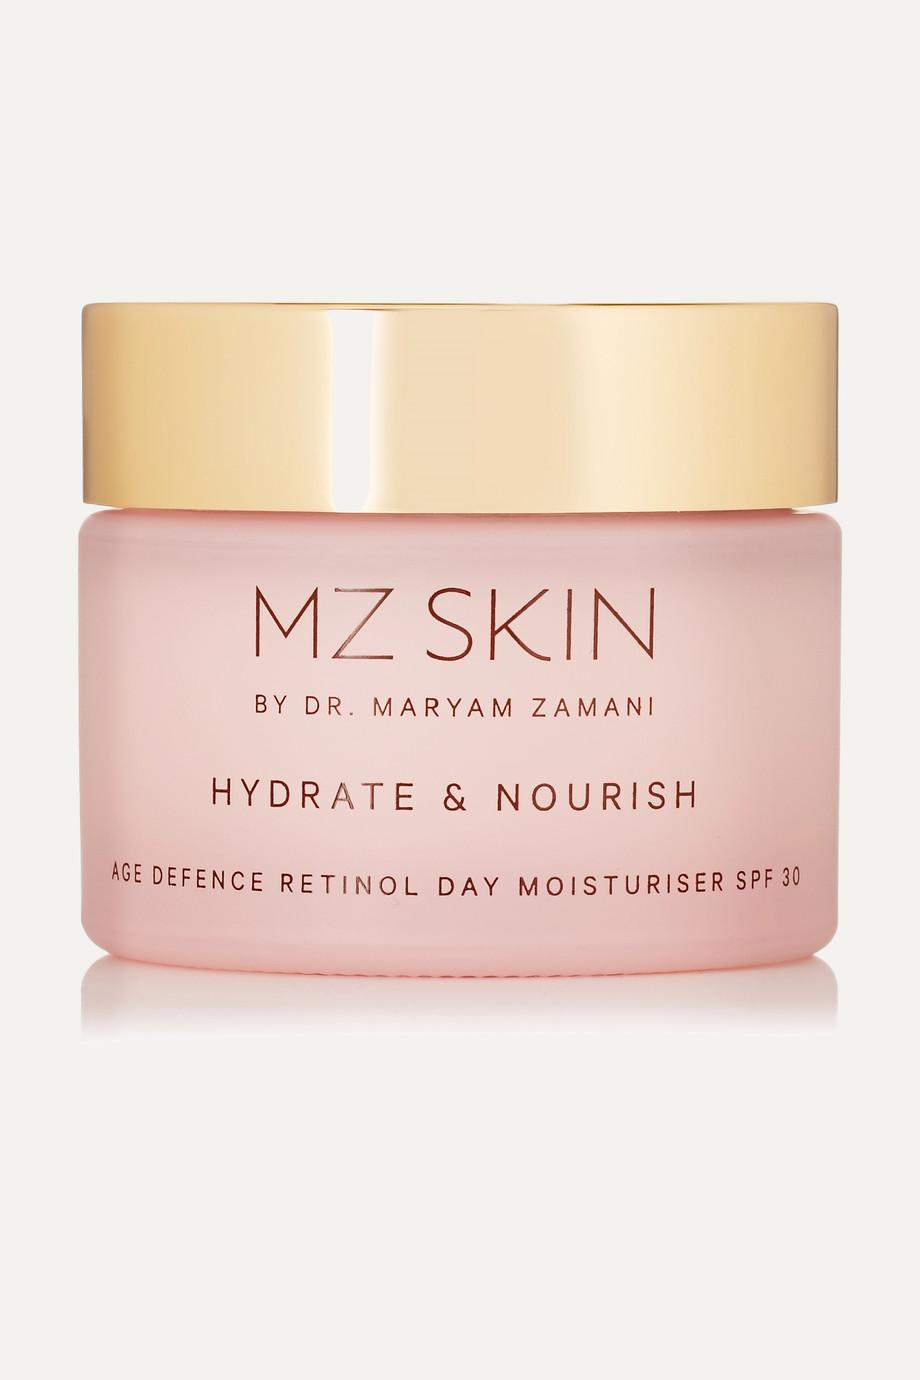 MZ Skin Hydrate & Nourish Age Defence Retinol Day Moisturizer SPF30, 50ml